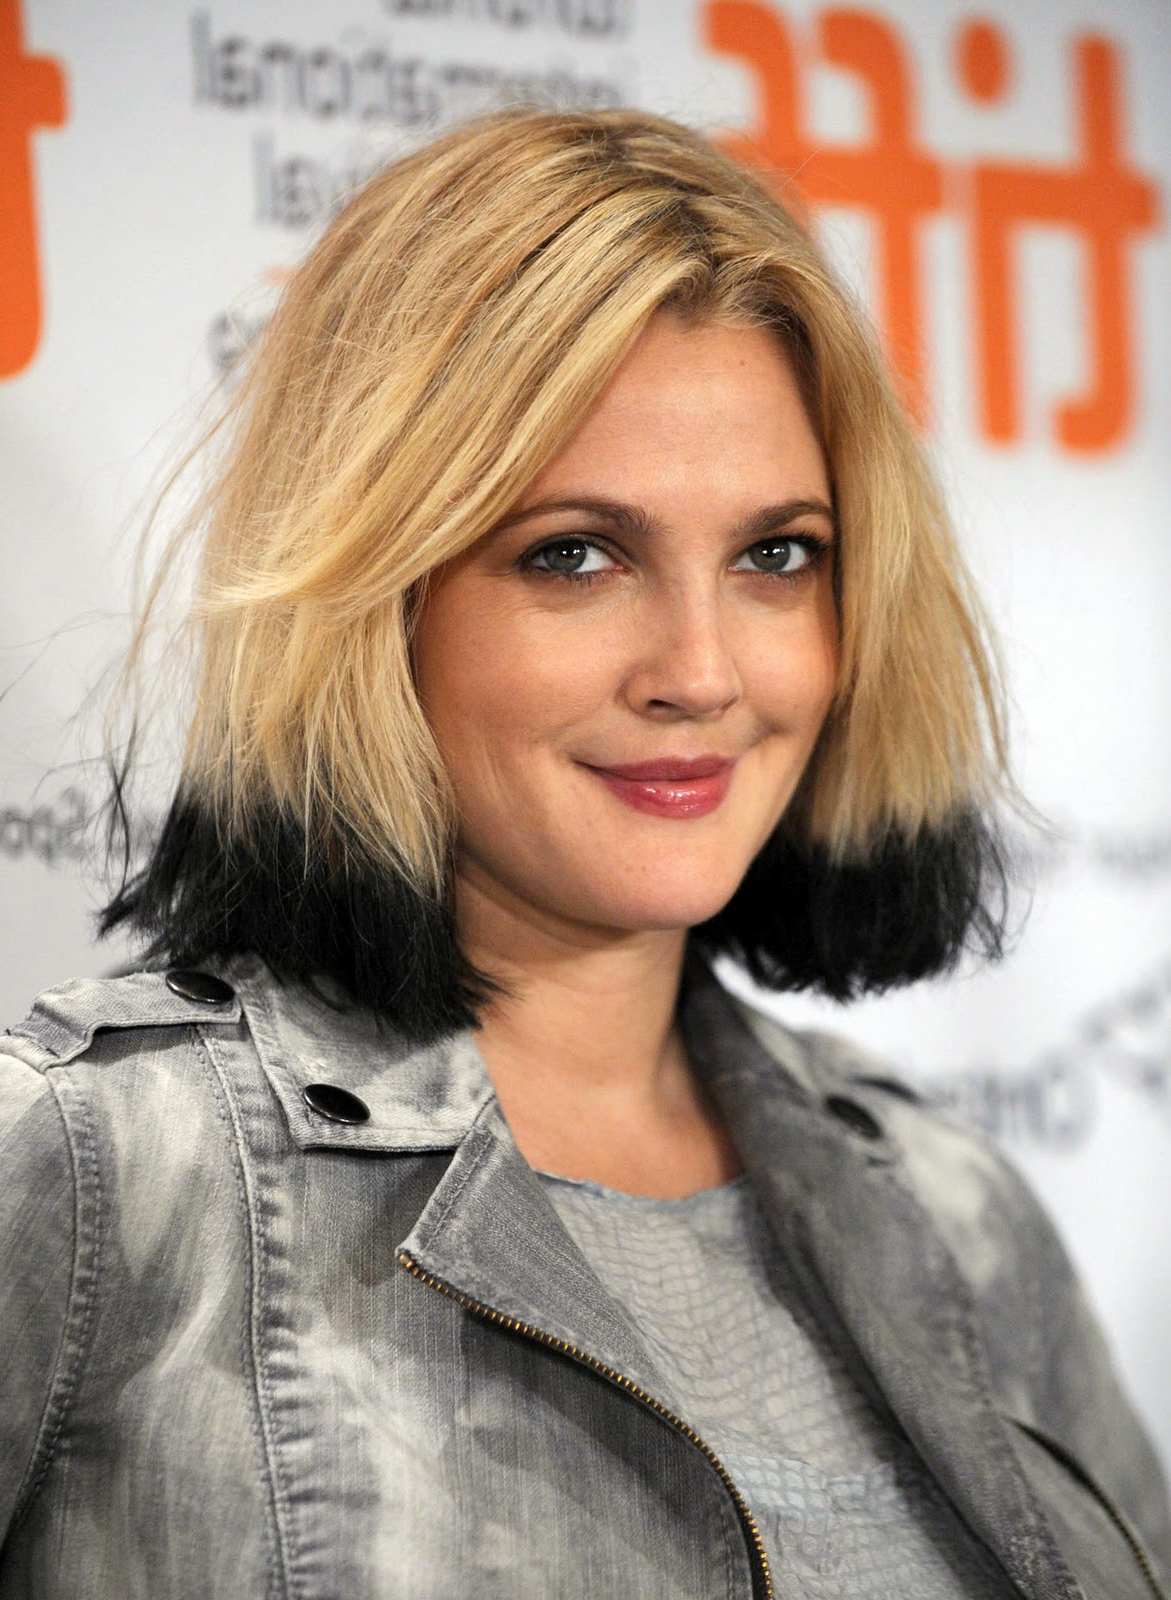 Celebrity Hairstyles Drew Barrymore   2013 Hair Trends Regarding Drew Barrymore Short Haircuts (View 10 of 25)